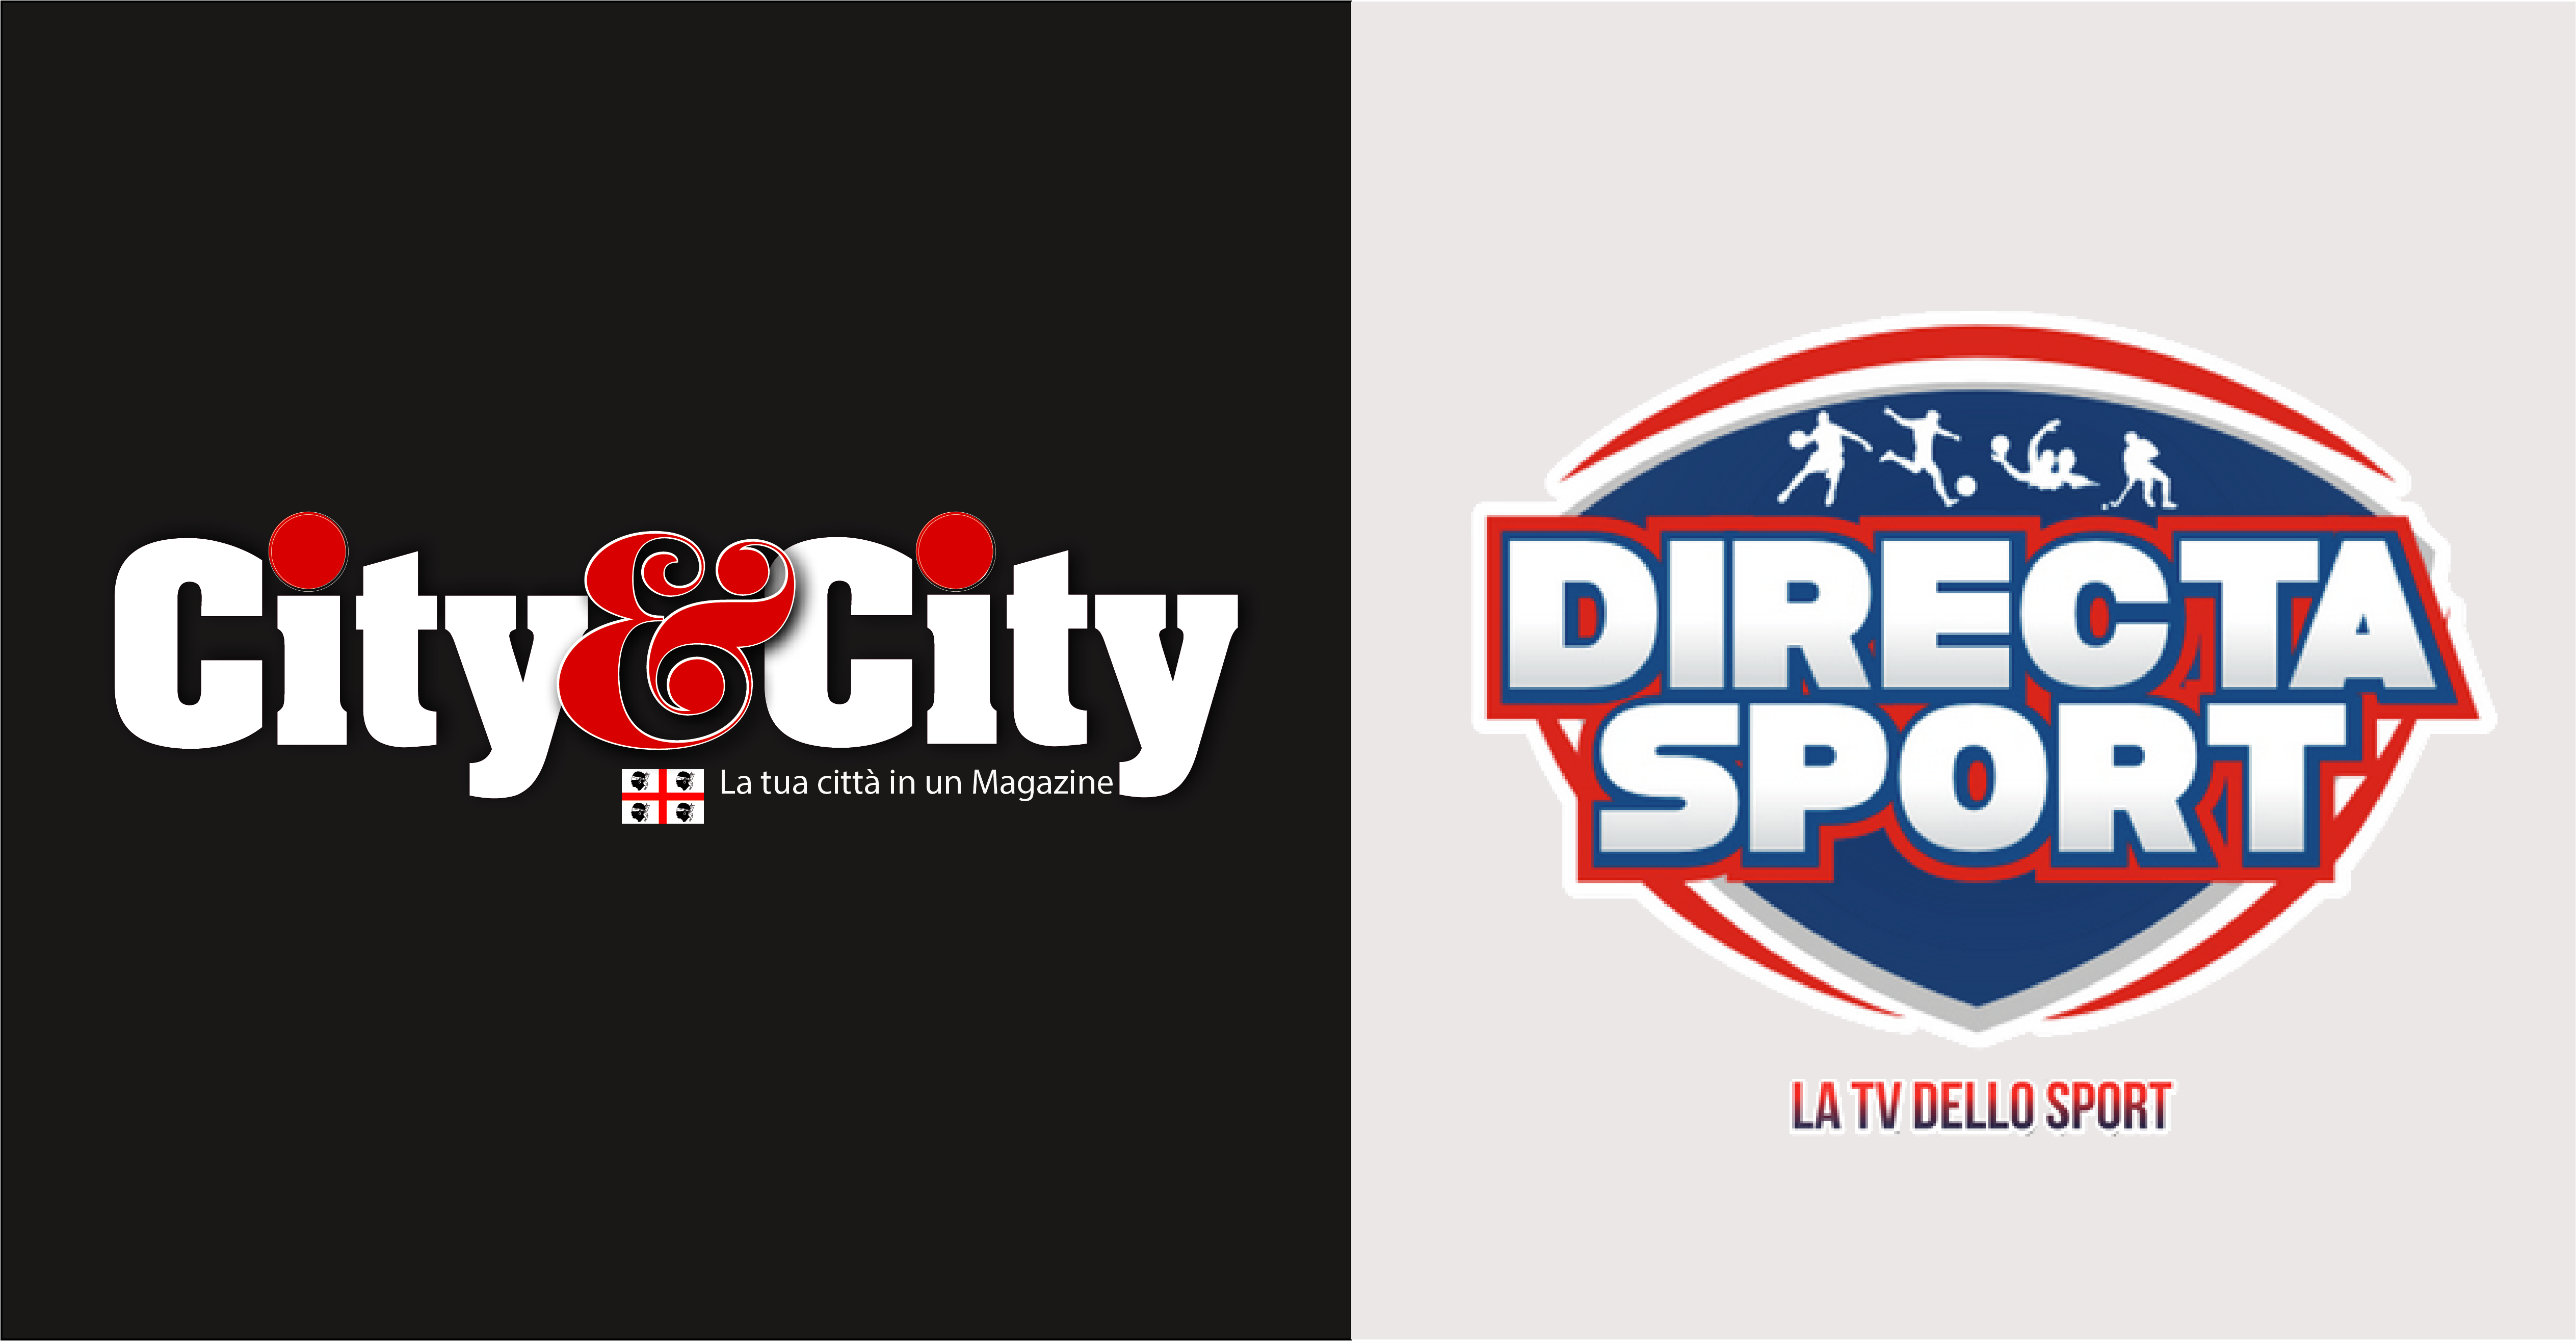 Nasce la partnership Directa Sport e City&City Magazine